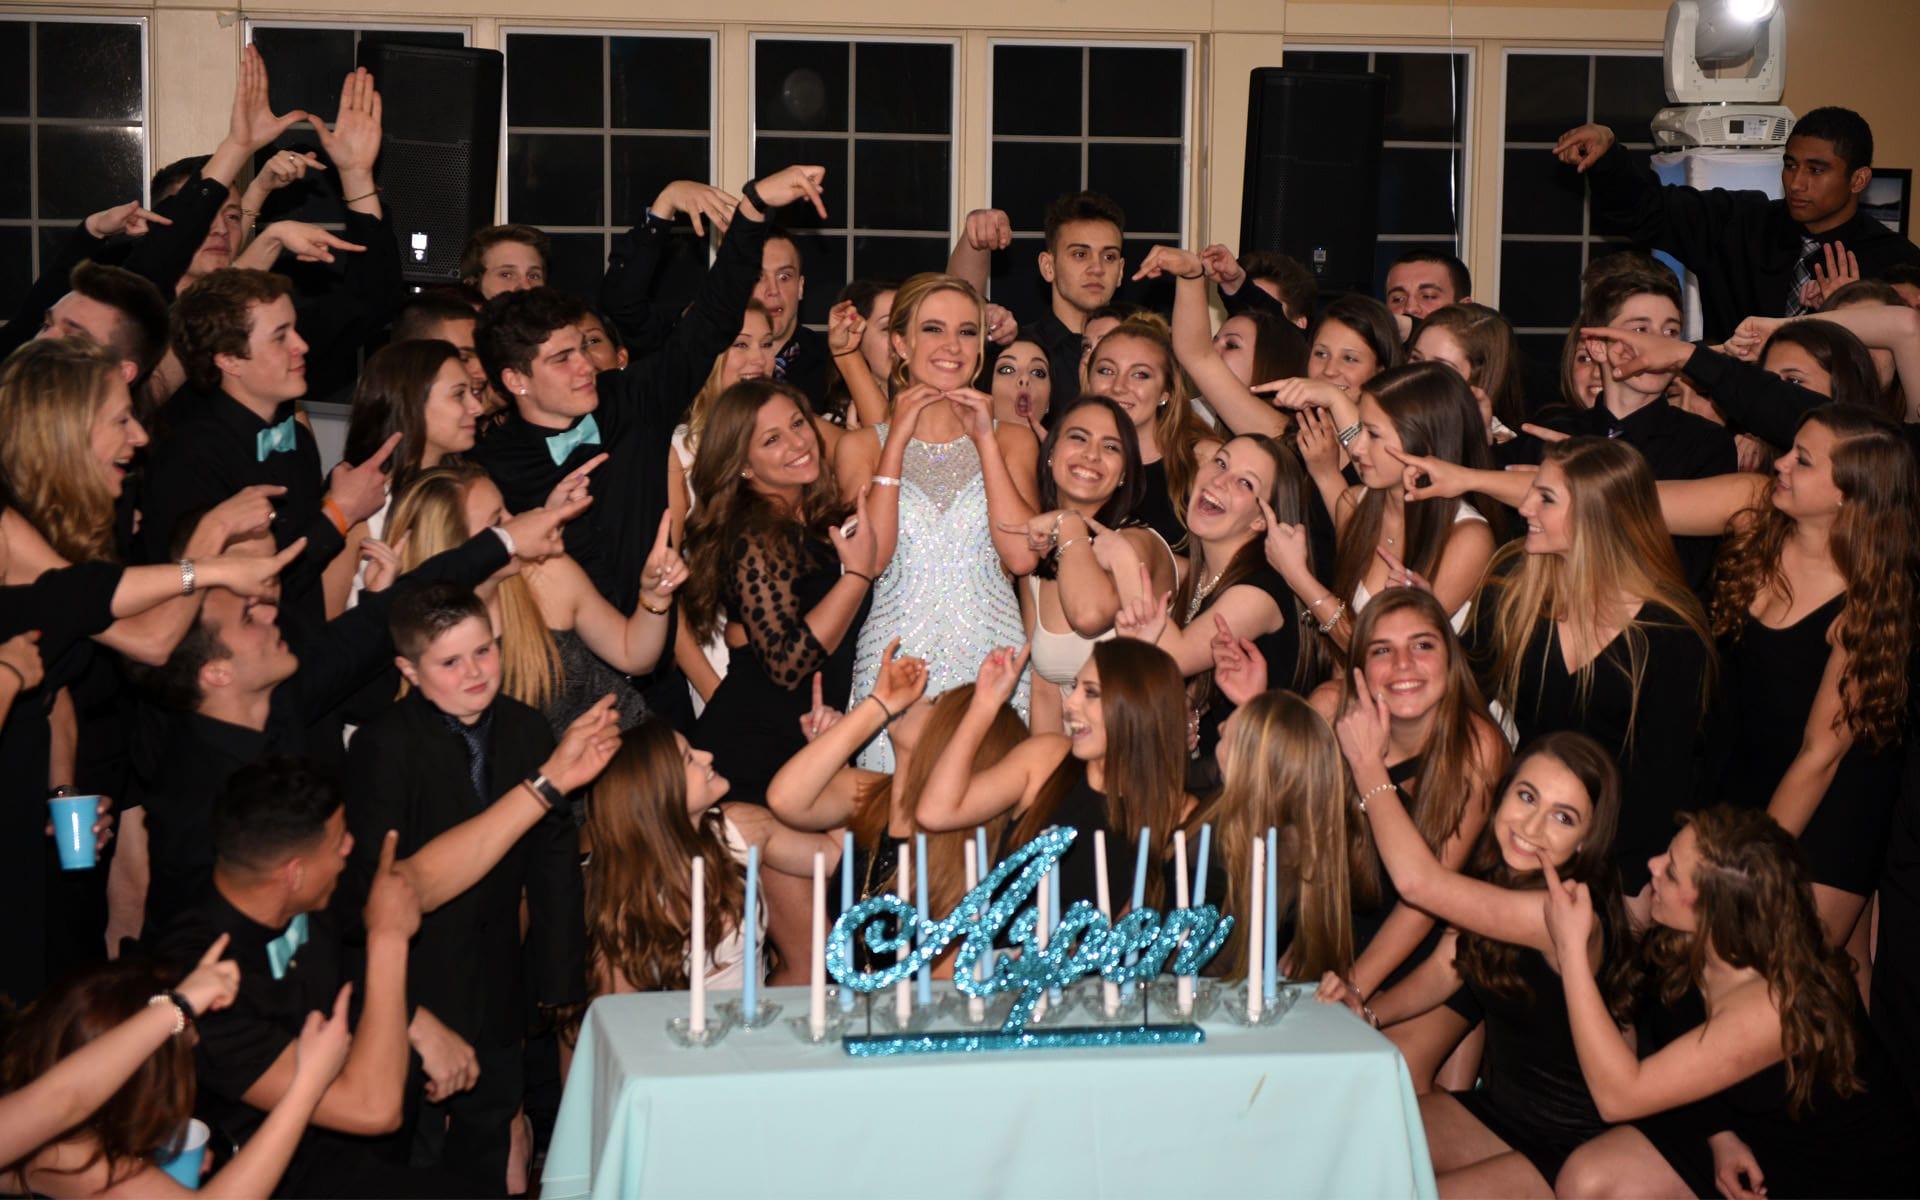 Sweet-Sixteen-Candle-Lighting-Ceremony-NJ-DJ-1920-1200-min